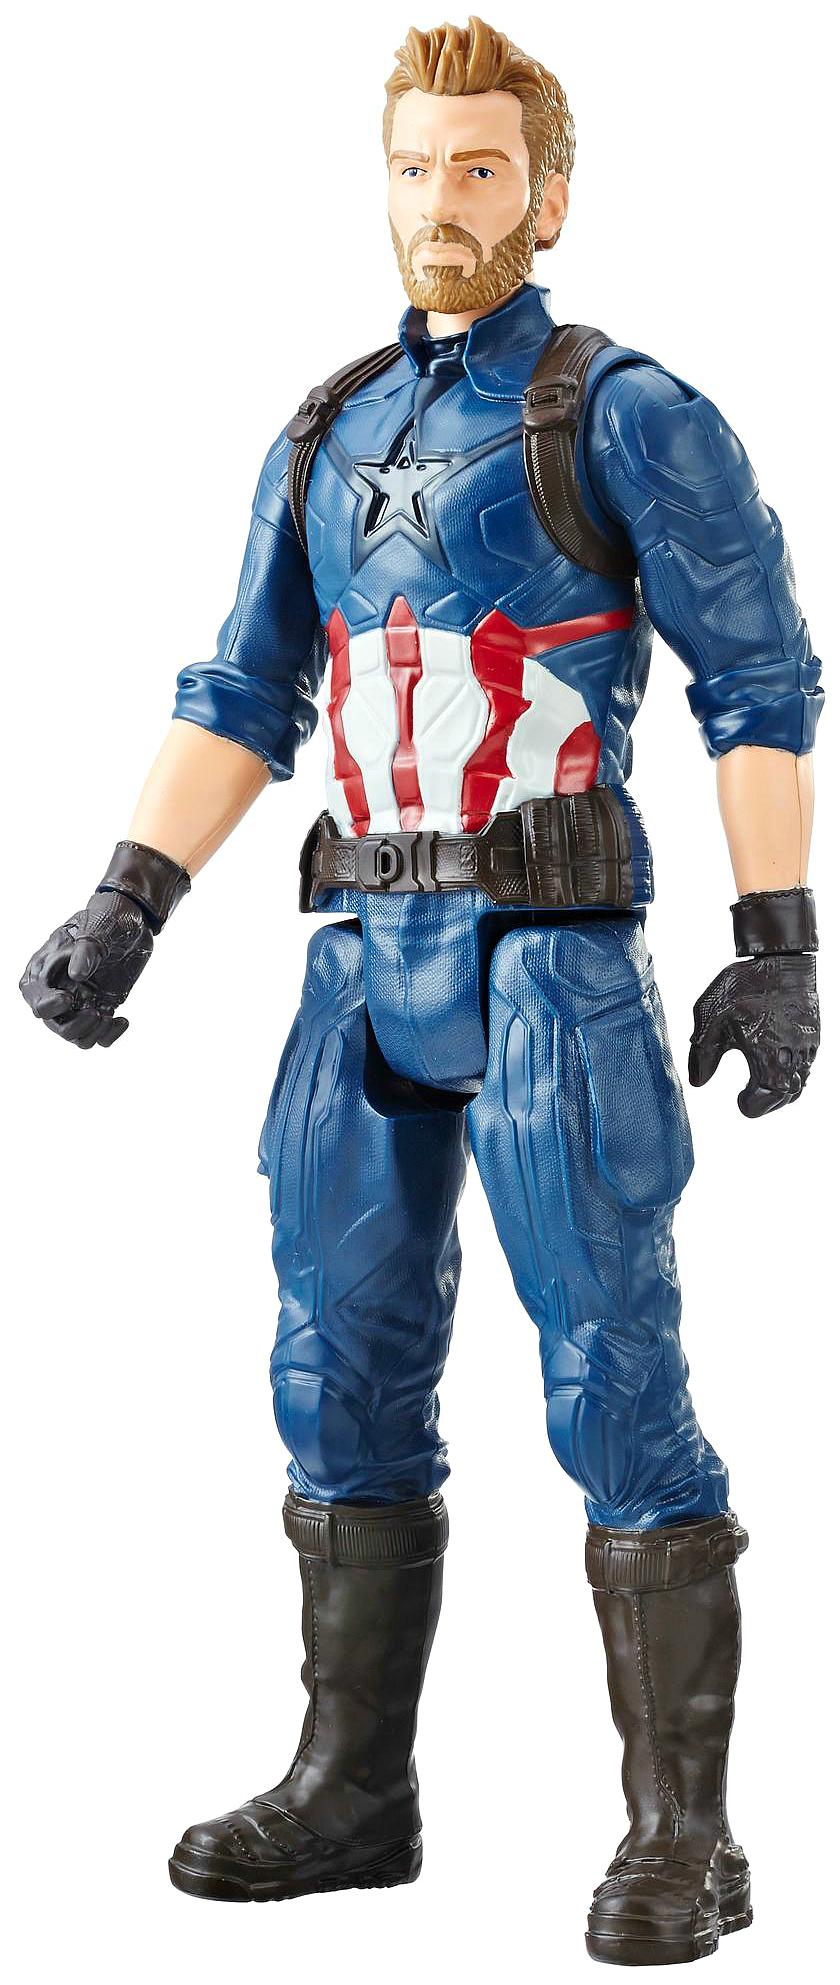 Купить E0570/e1421 фигурка мстители титаны капитан америка, Фигурка персонажа Hasbro Avengers E0570/E1421 МСТИТЕЛИ Титаны Капитан Америка, Игровые наборы